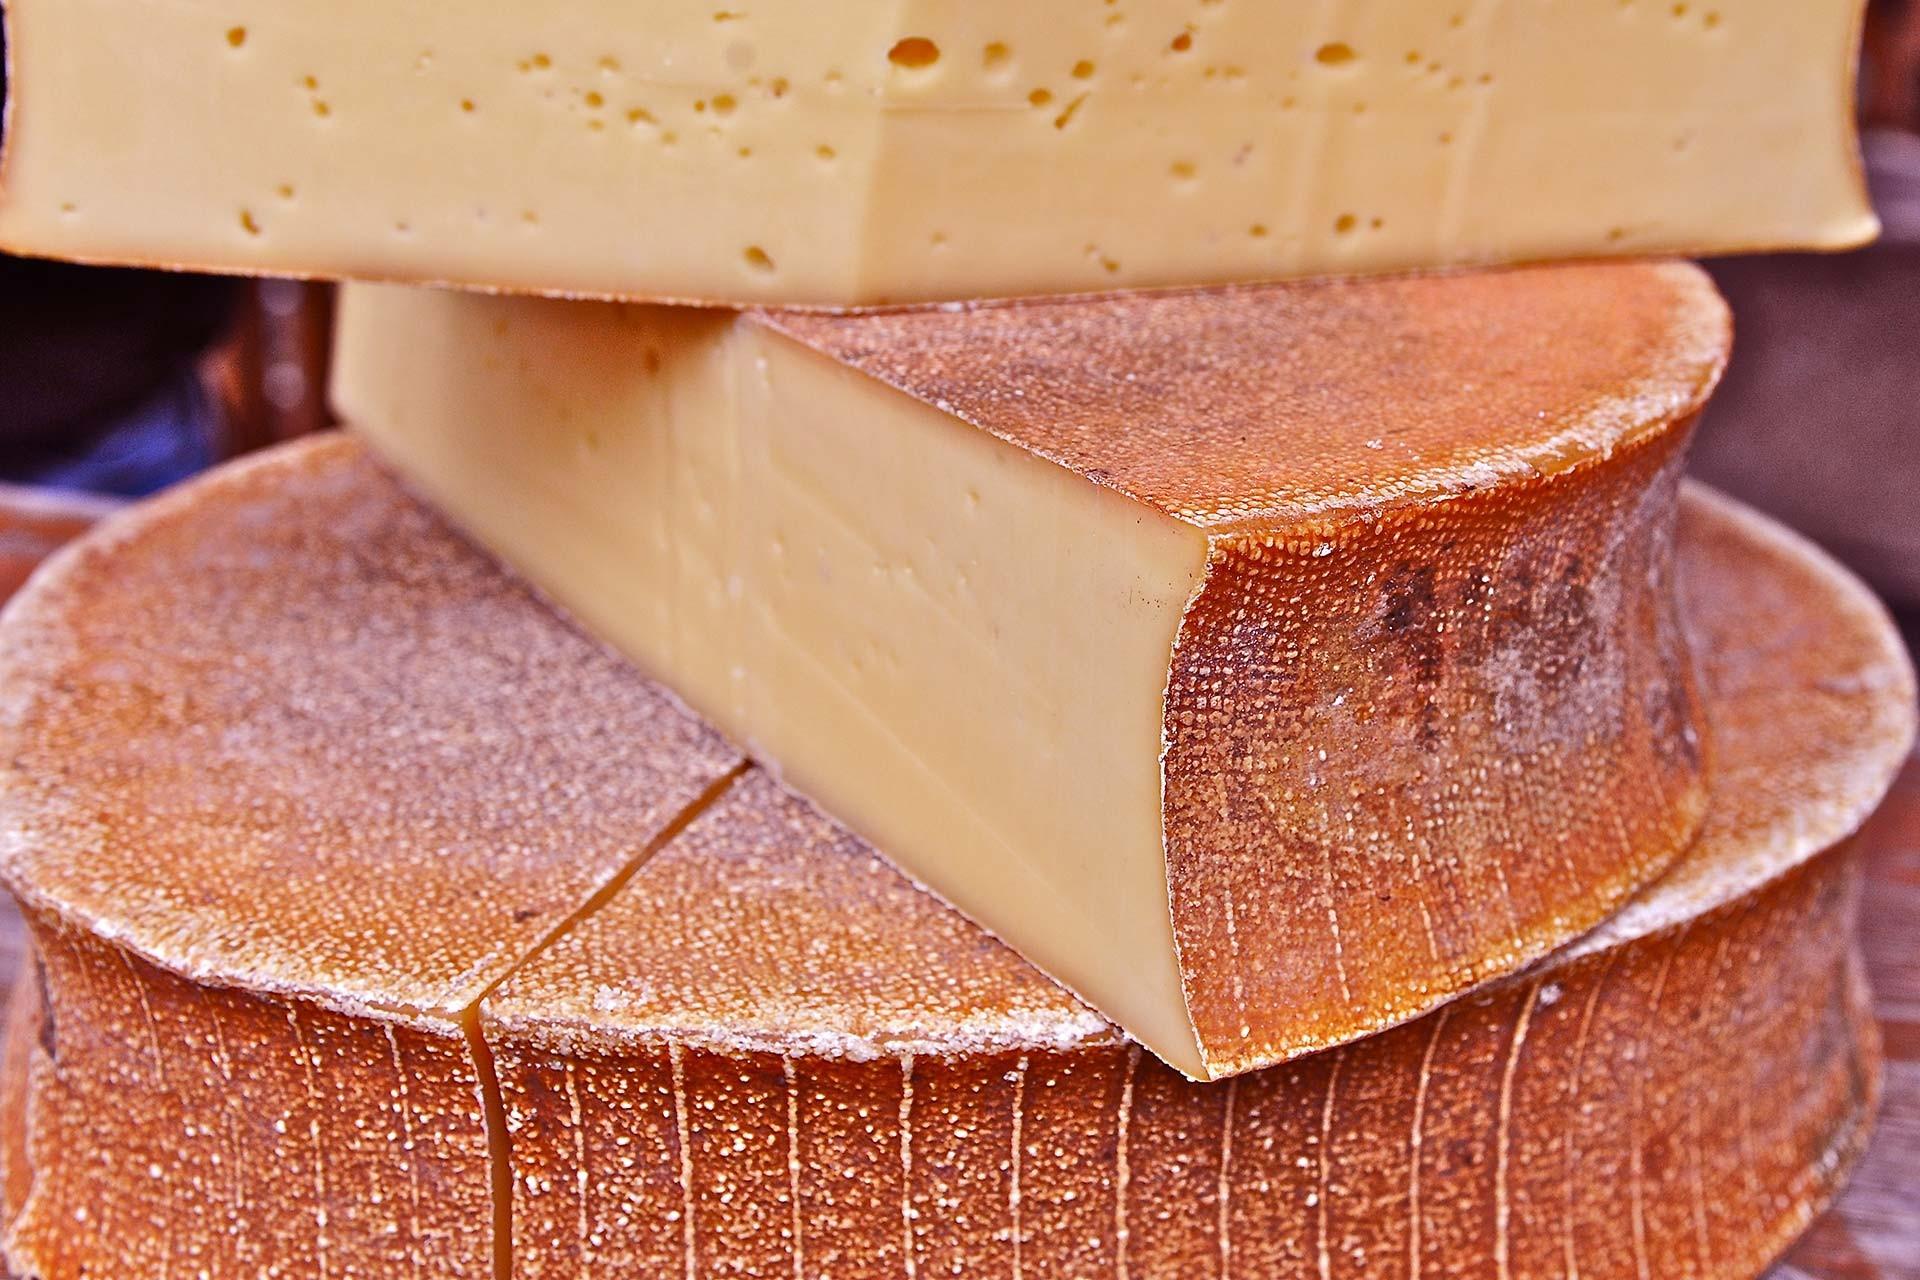 Abondance-kaas, een BOB-product